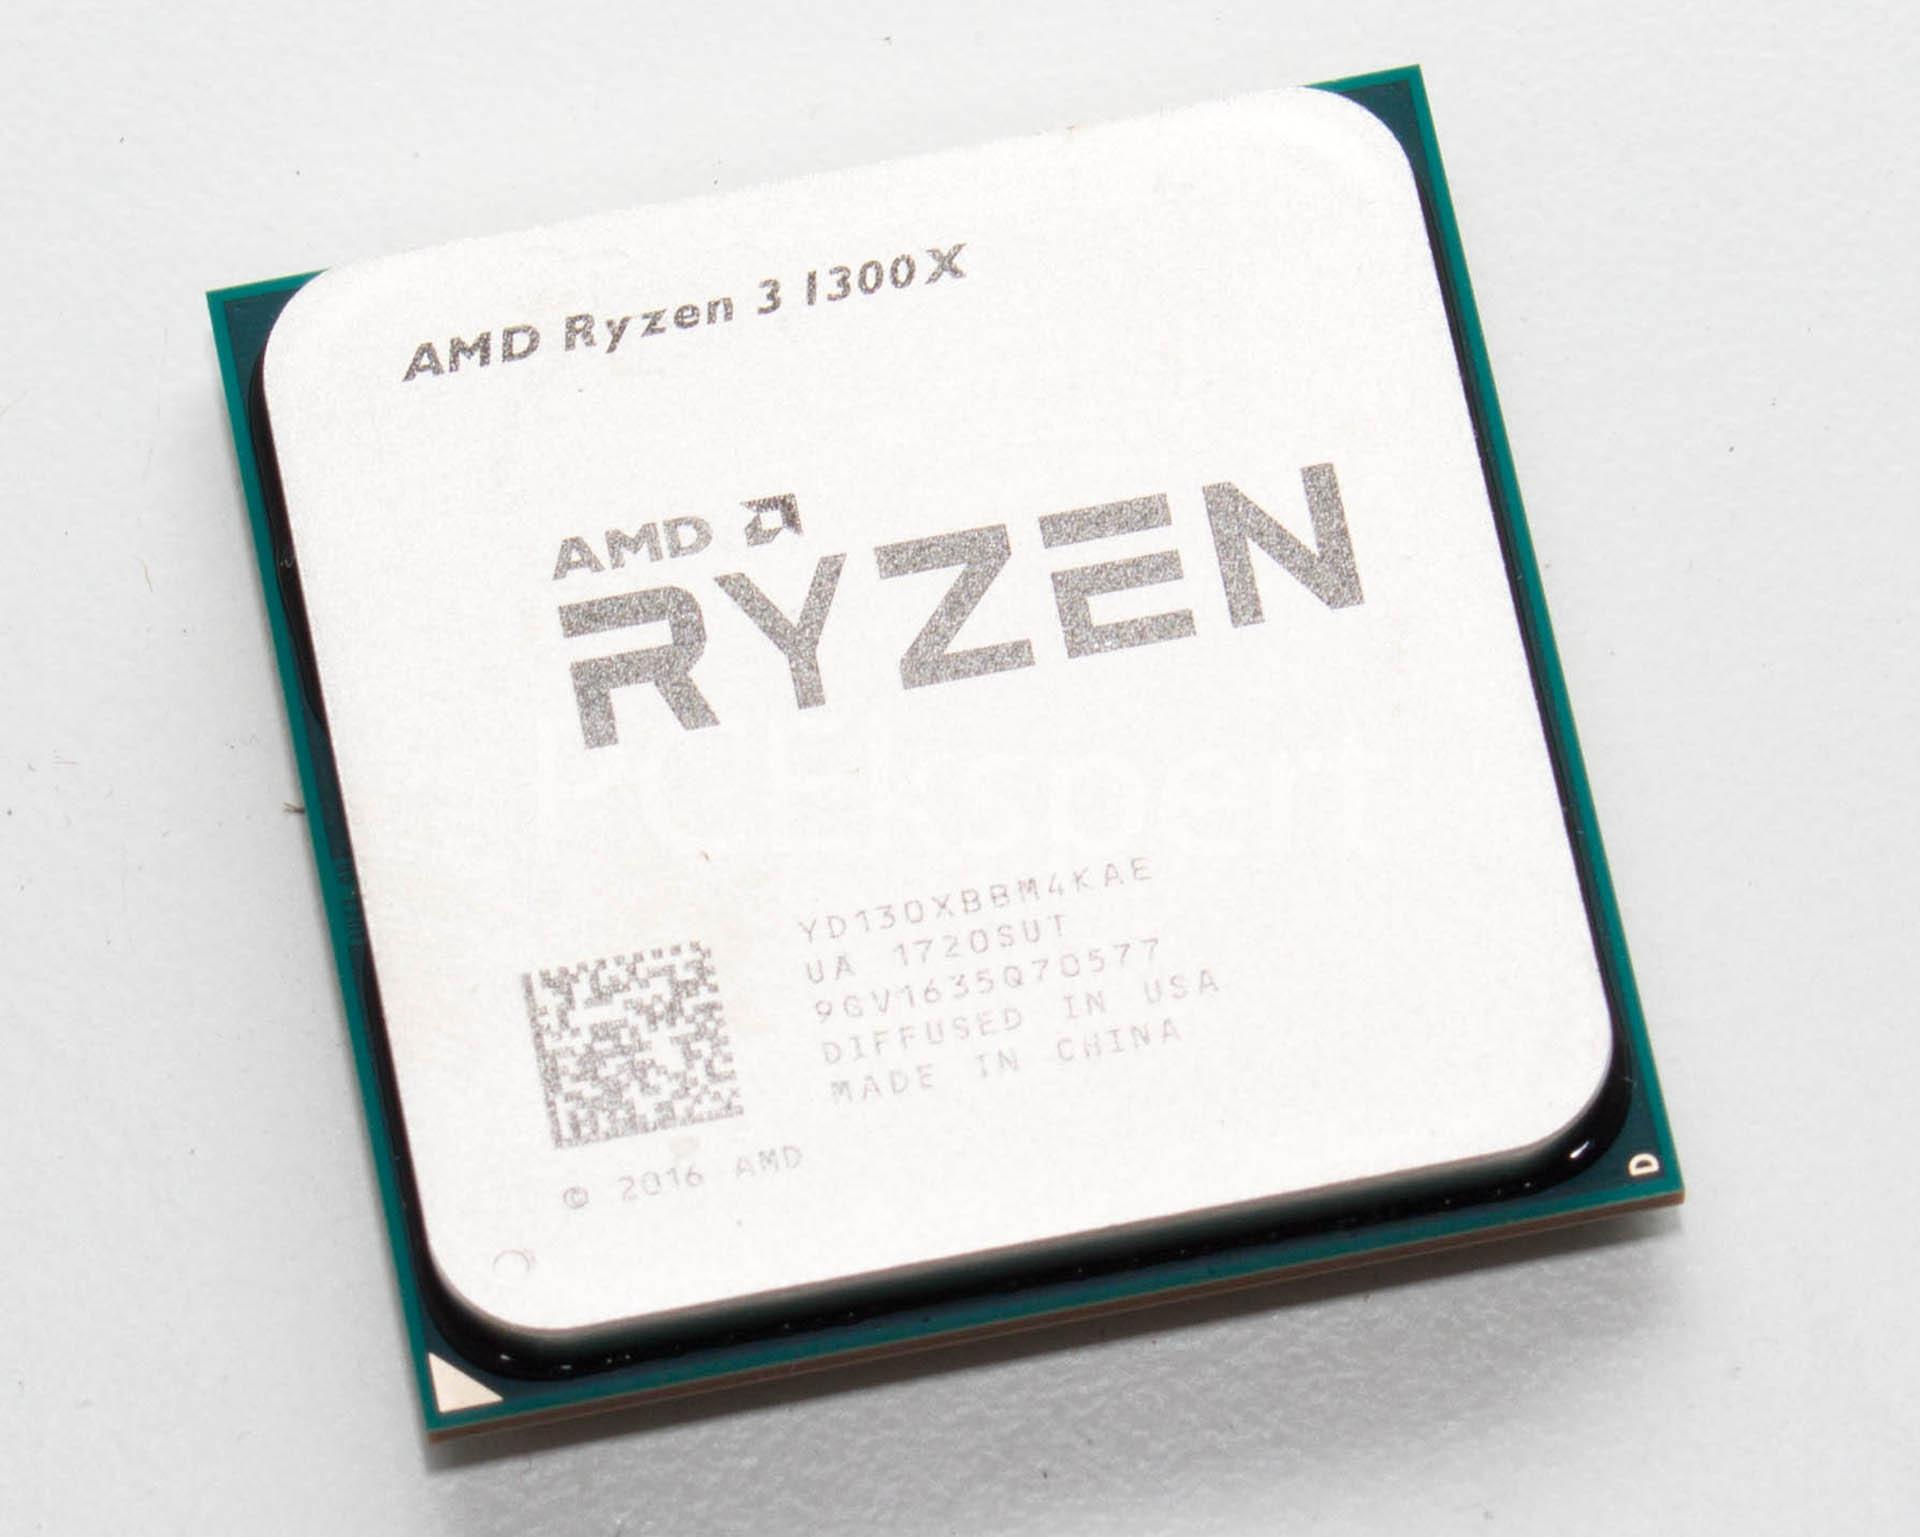 AMD-ov ljetni giveaway